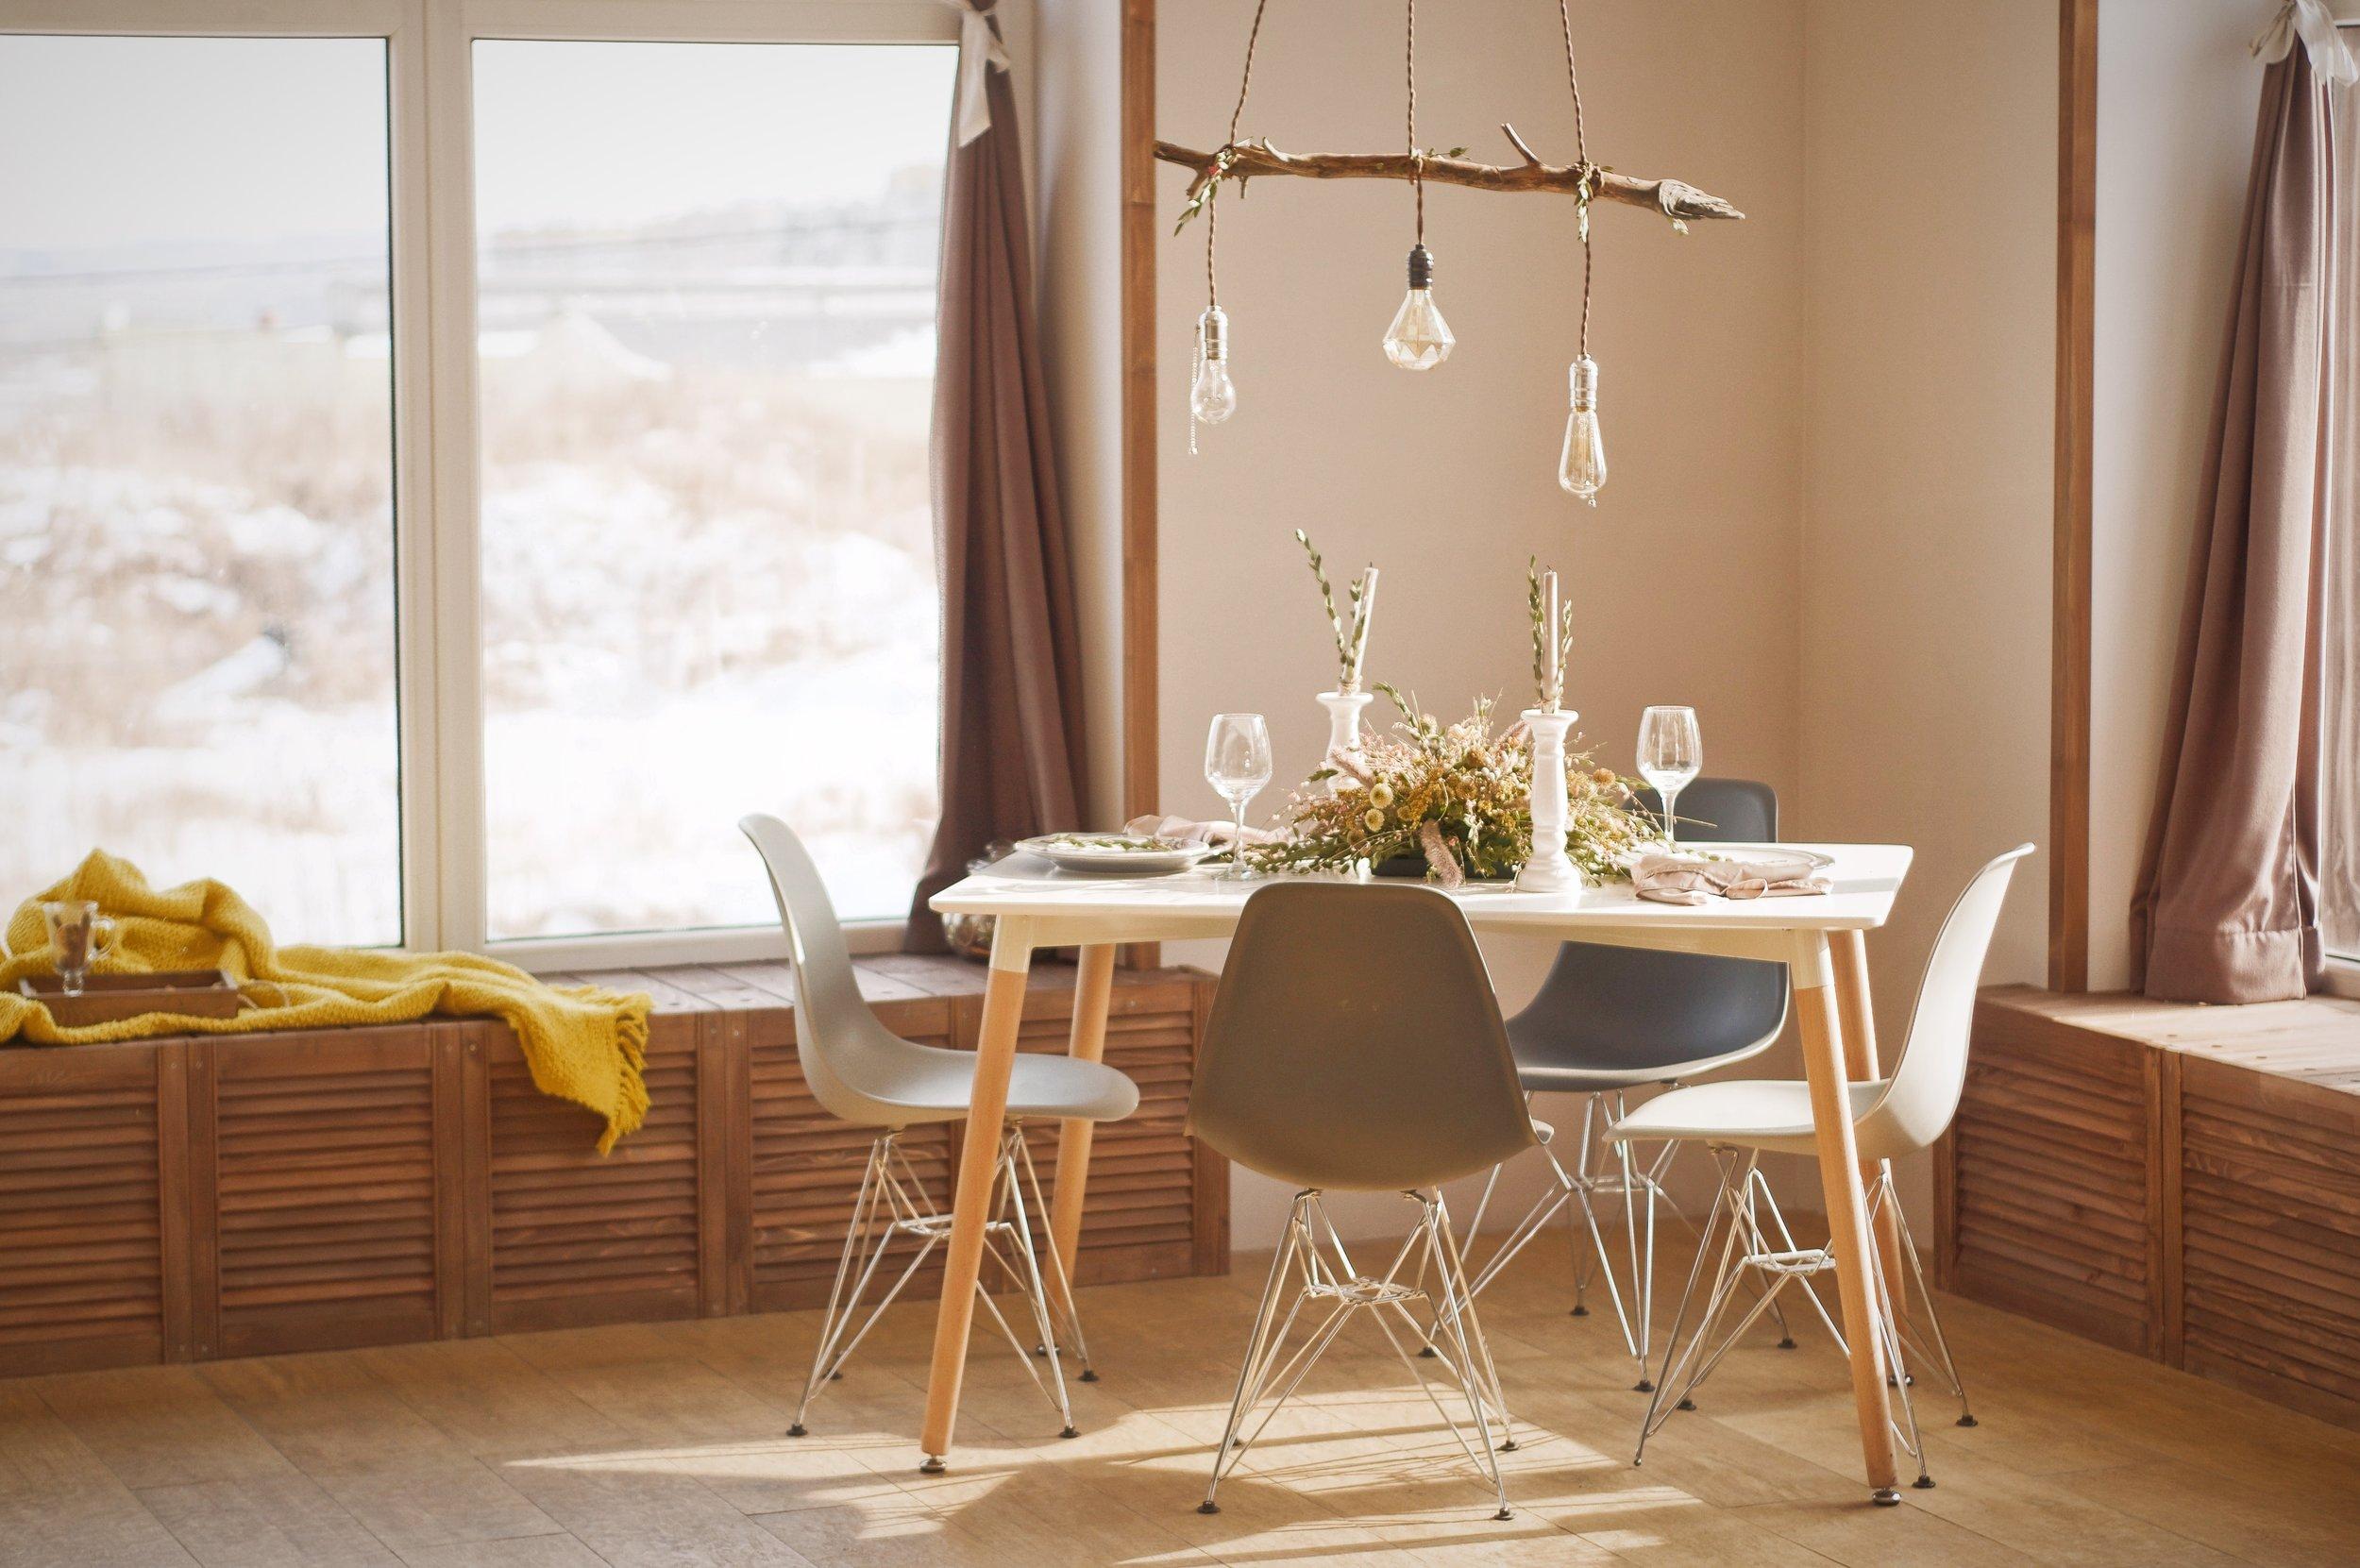 Copy of Copy of Living Room